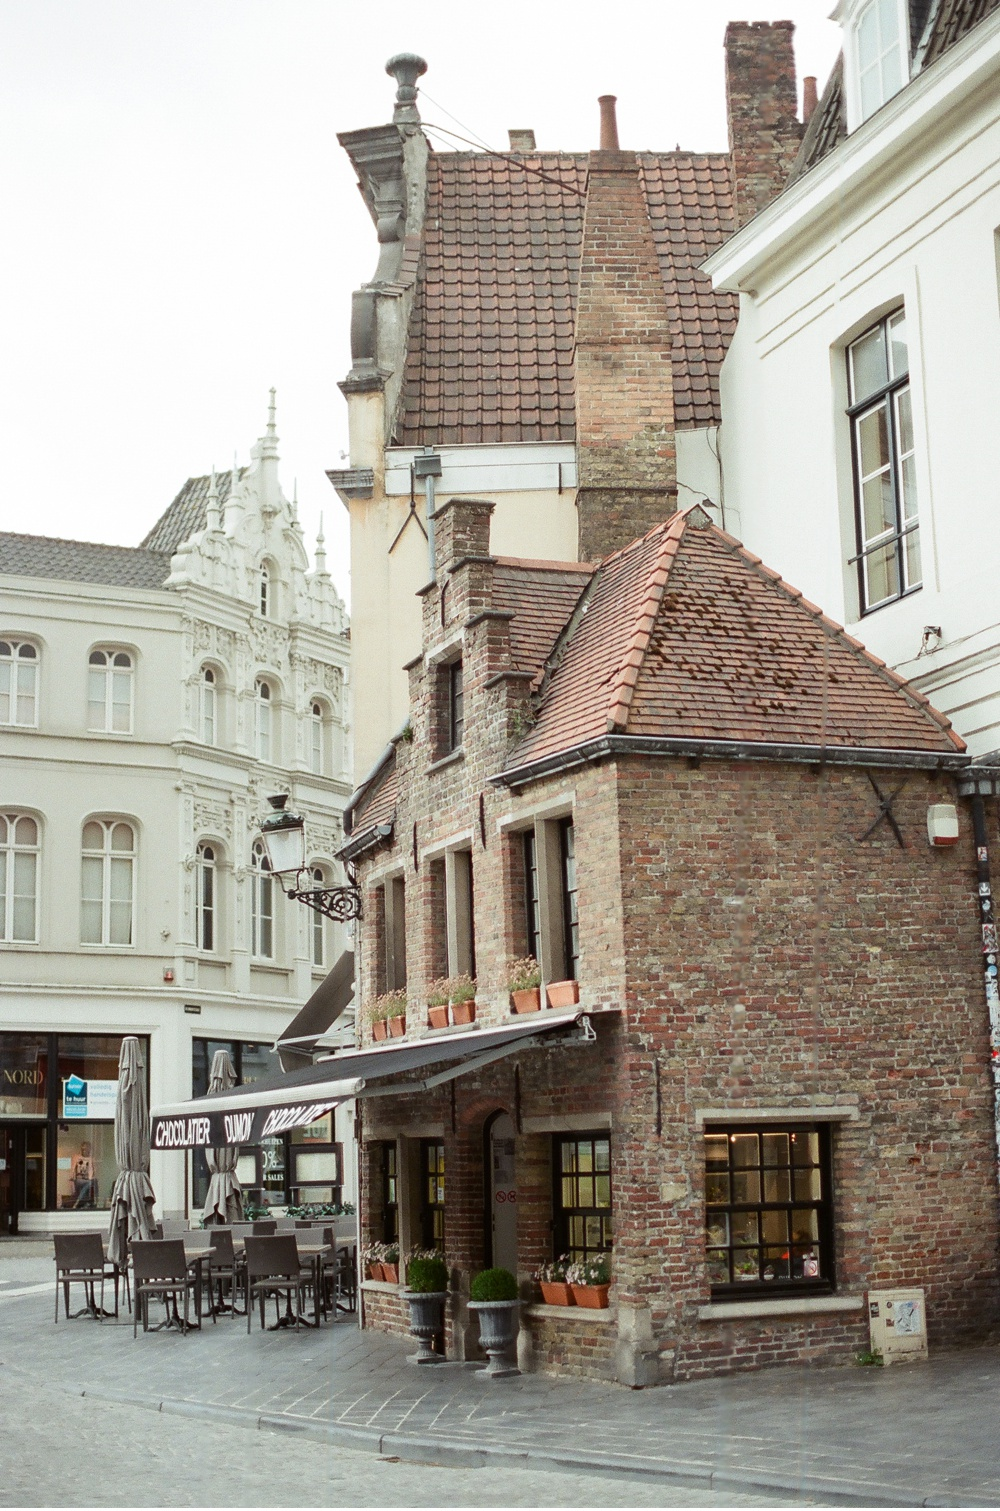 Brugge_Belgium_WeddingPhotographer©MadalinaSheldon_0022.jpg